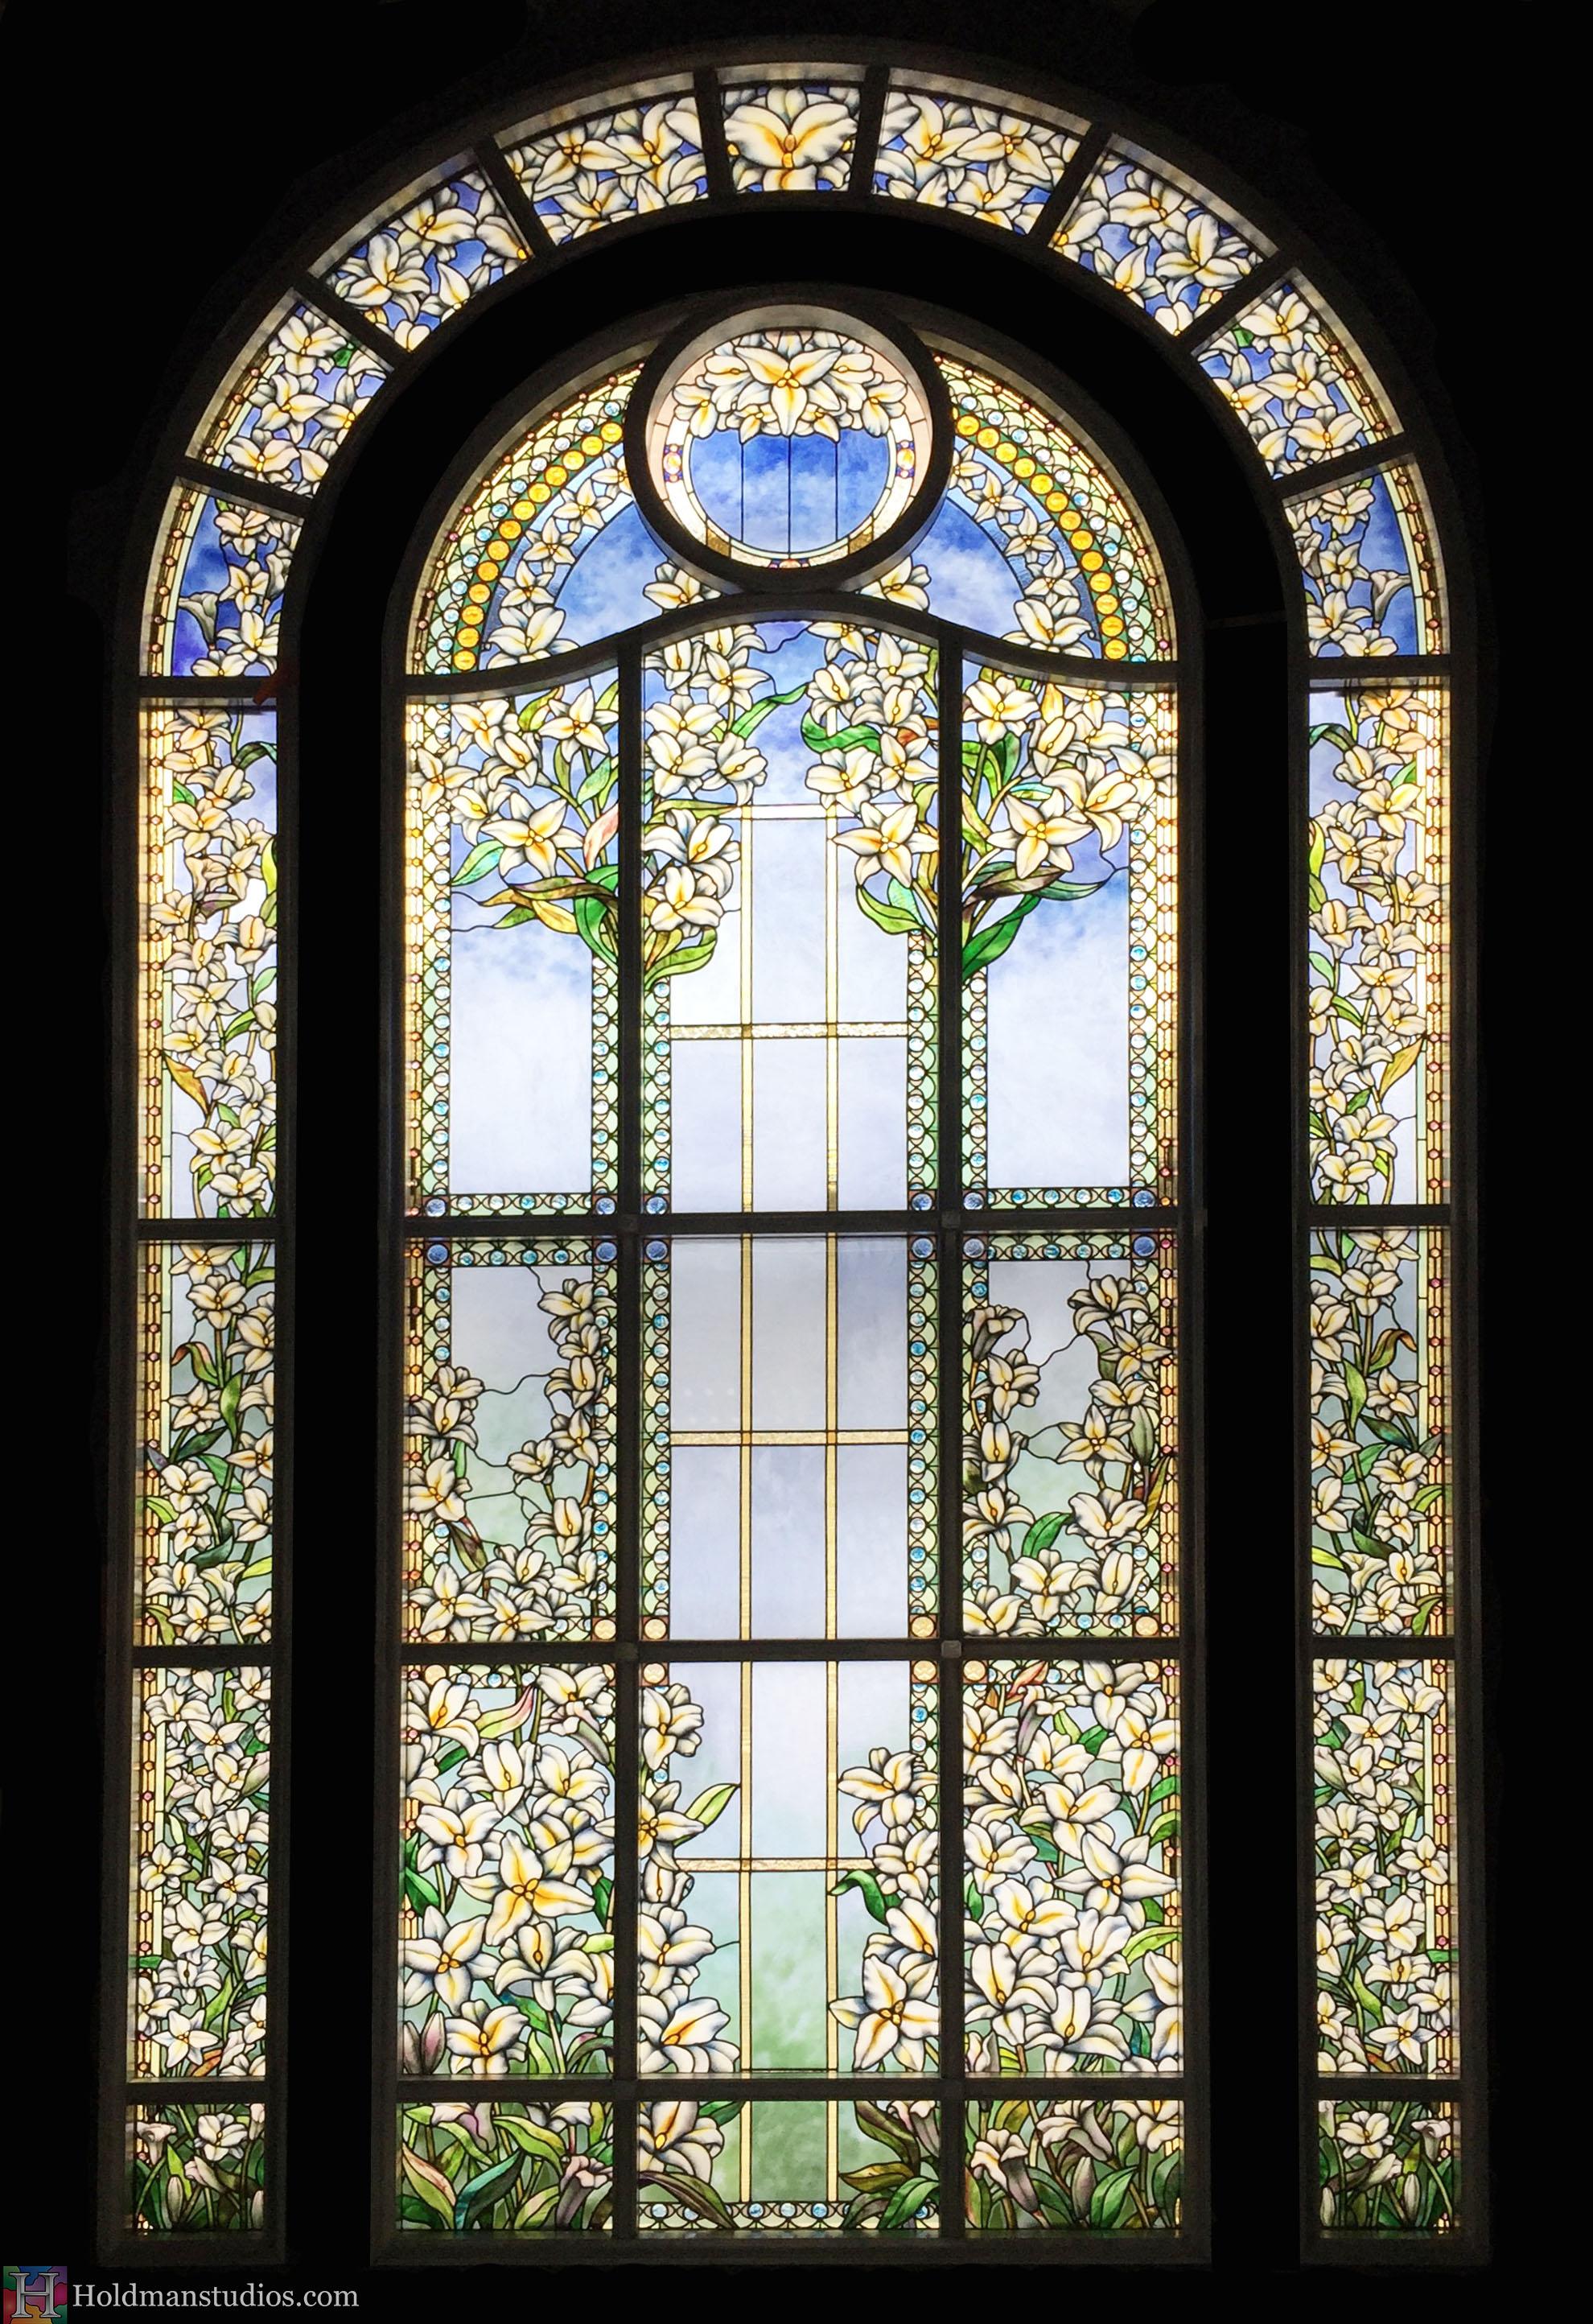 Holdman-Studios-Paris-LDS-Temple-Stained-Glass-Madonna-Lily-Flowers-Leaves-Sun-Moon-Stars-Full-Window.jpg